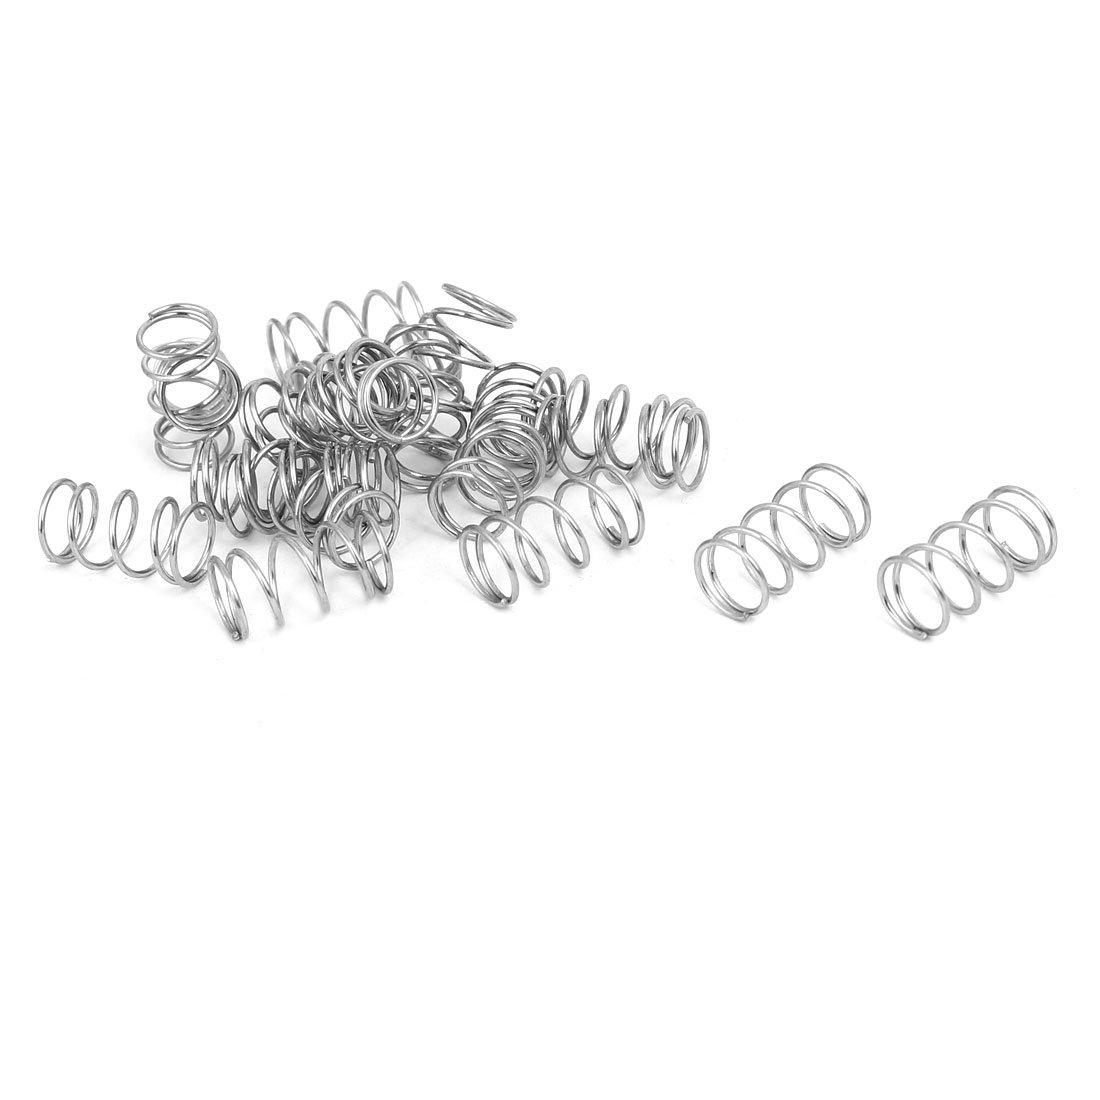 sourcingmap 20 Stü ck 0.7mmx8mmx15mm 304 Edelstahl Druckfedern Silber a17020800ux1409